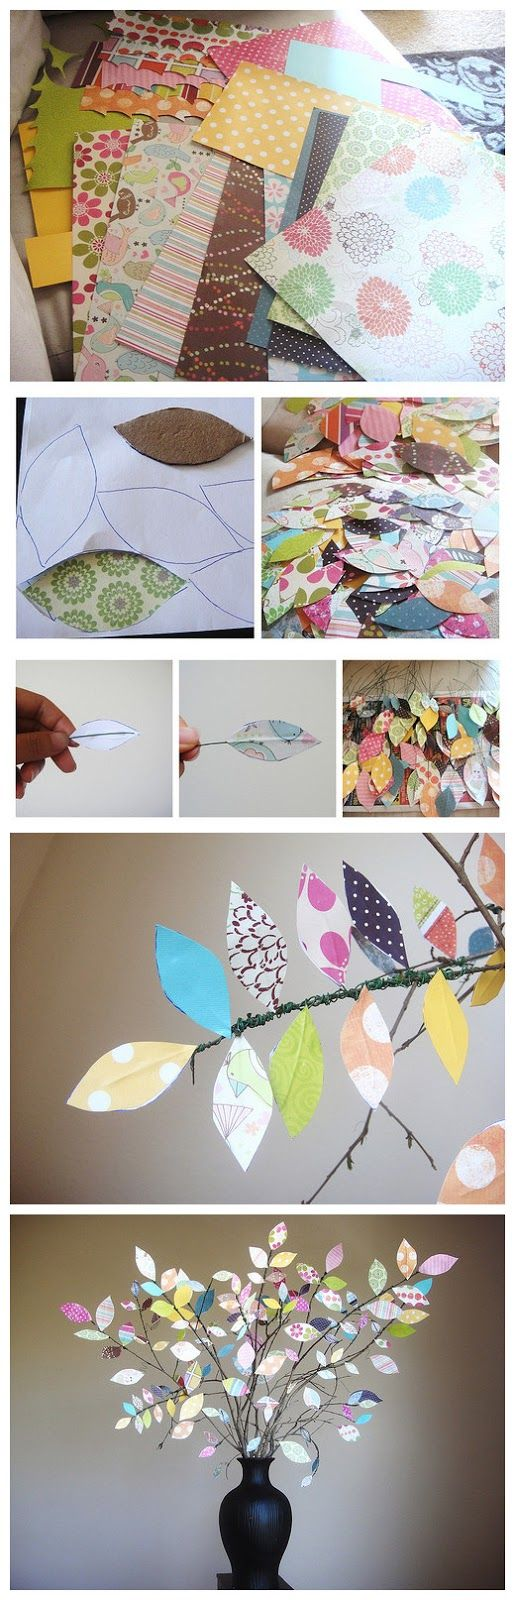 diy scrapbook paper branches http://www.everydaymomideas.com/2011/03/scrap-paper-tree-centerpiece-tutorial.html